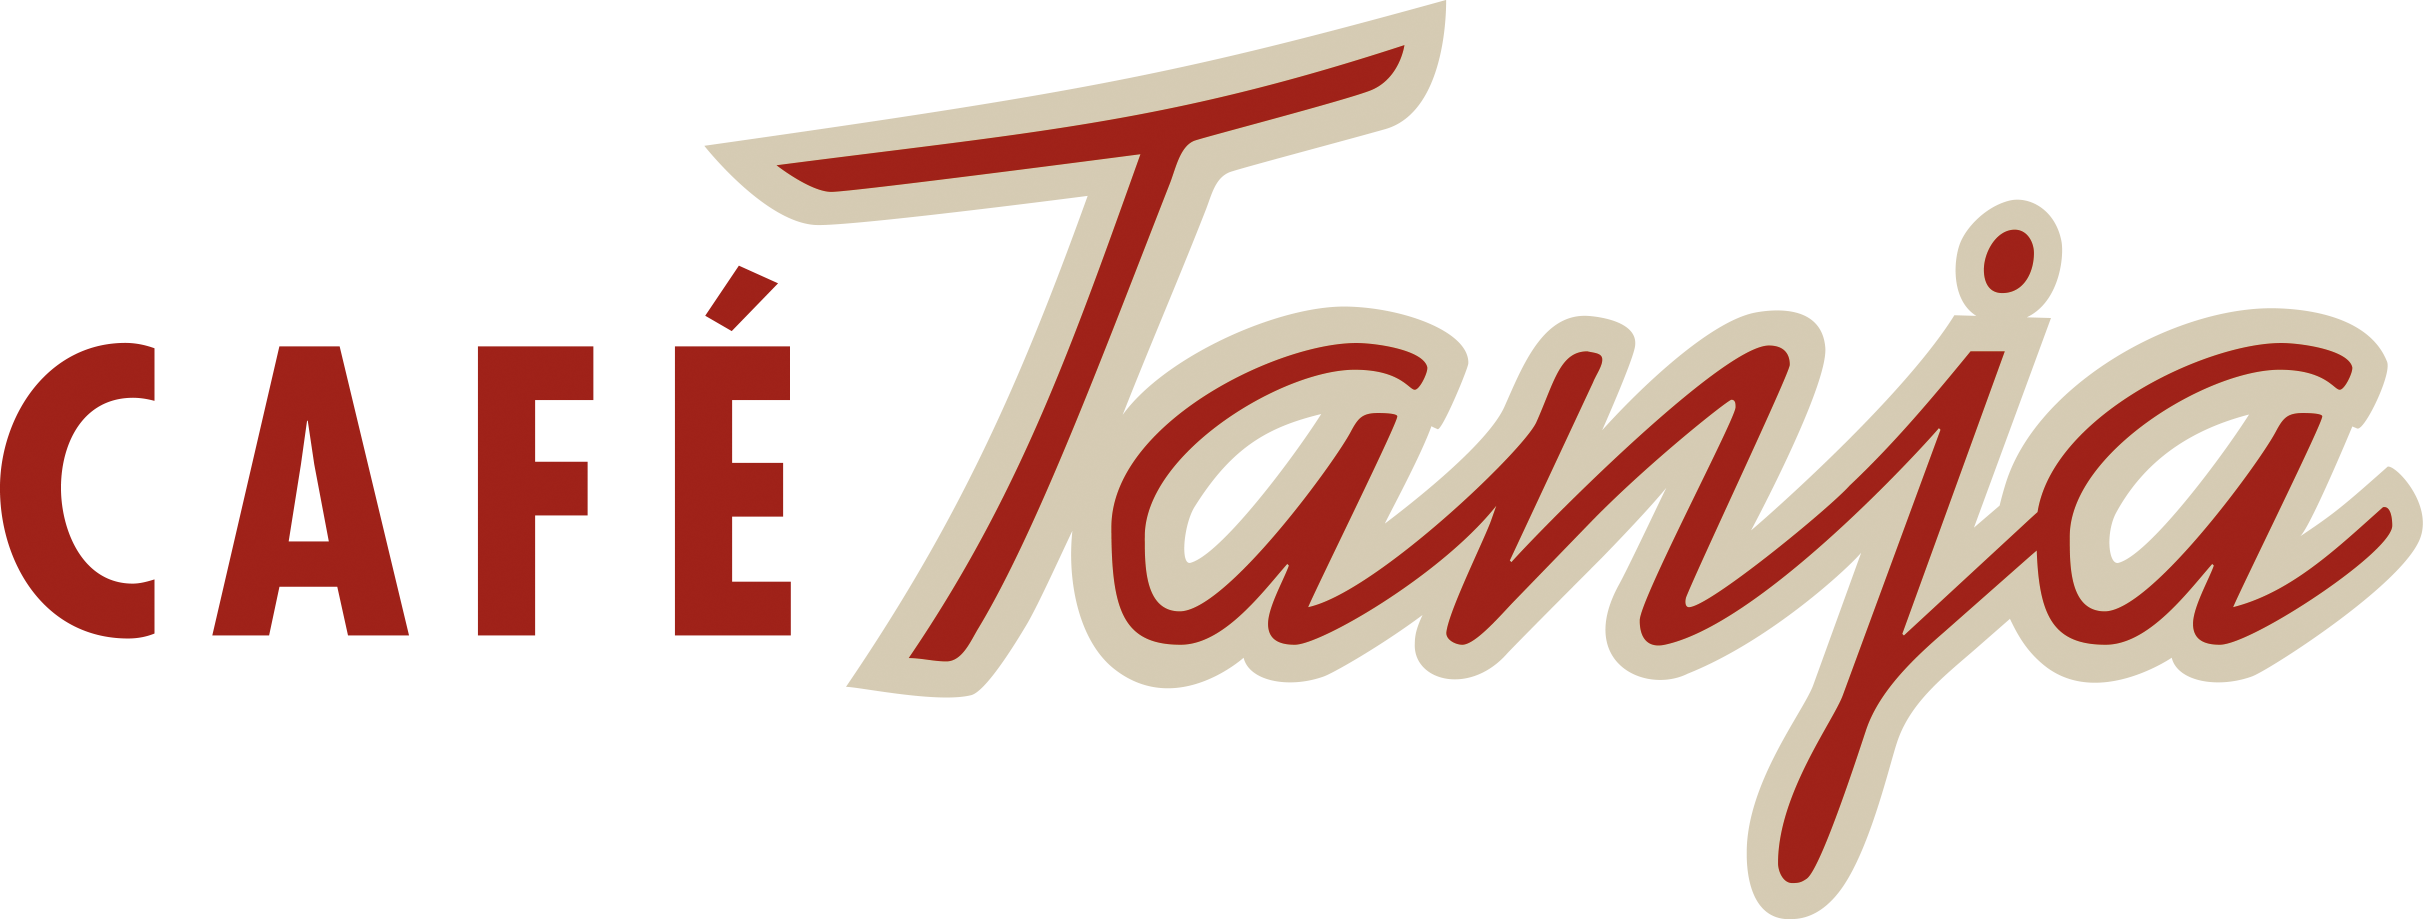 Cafe Tanja